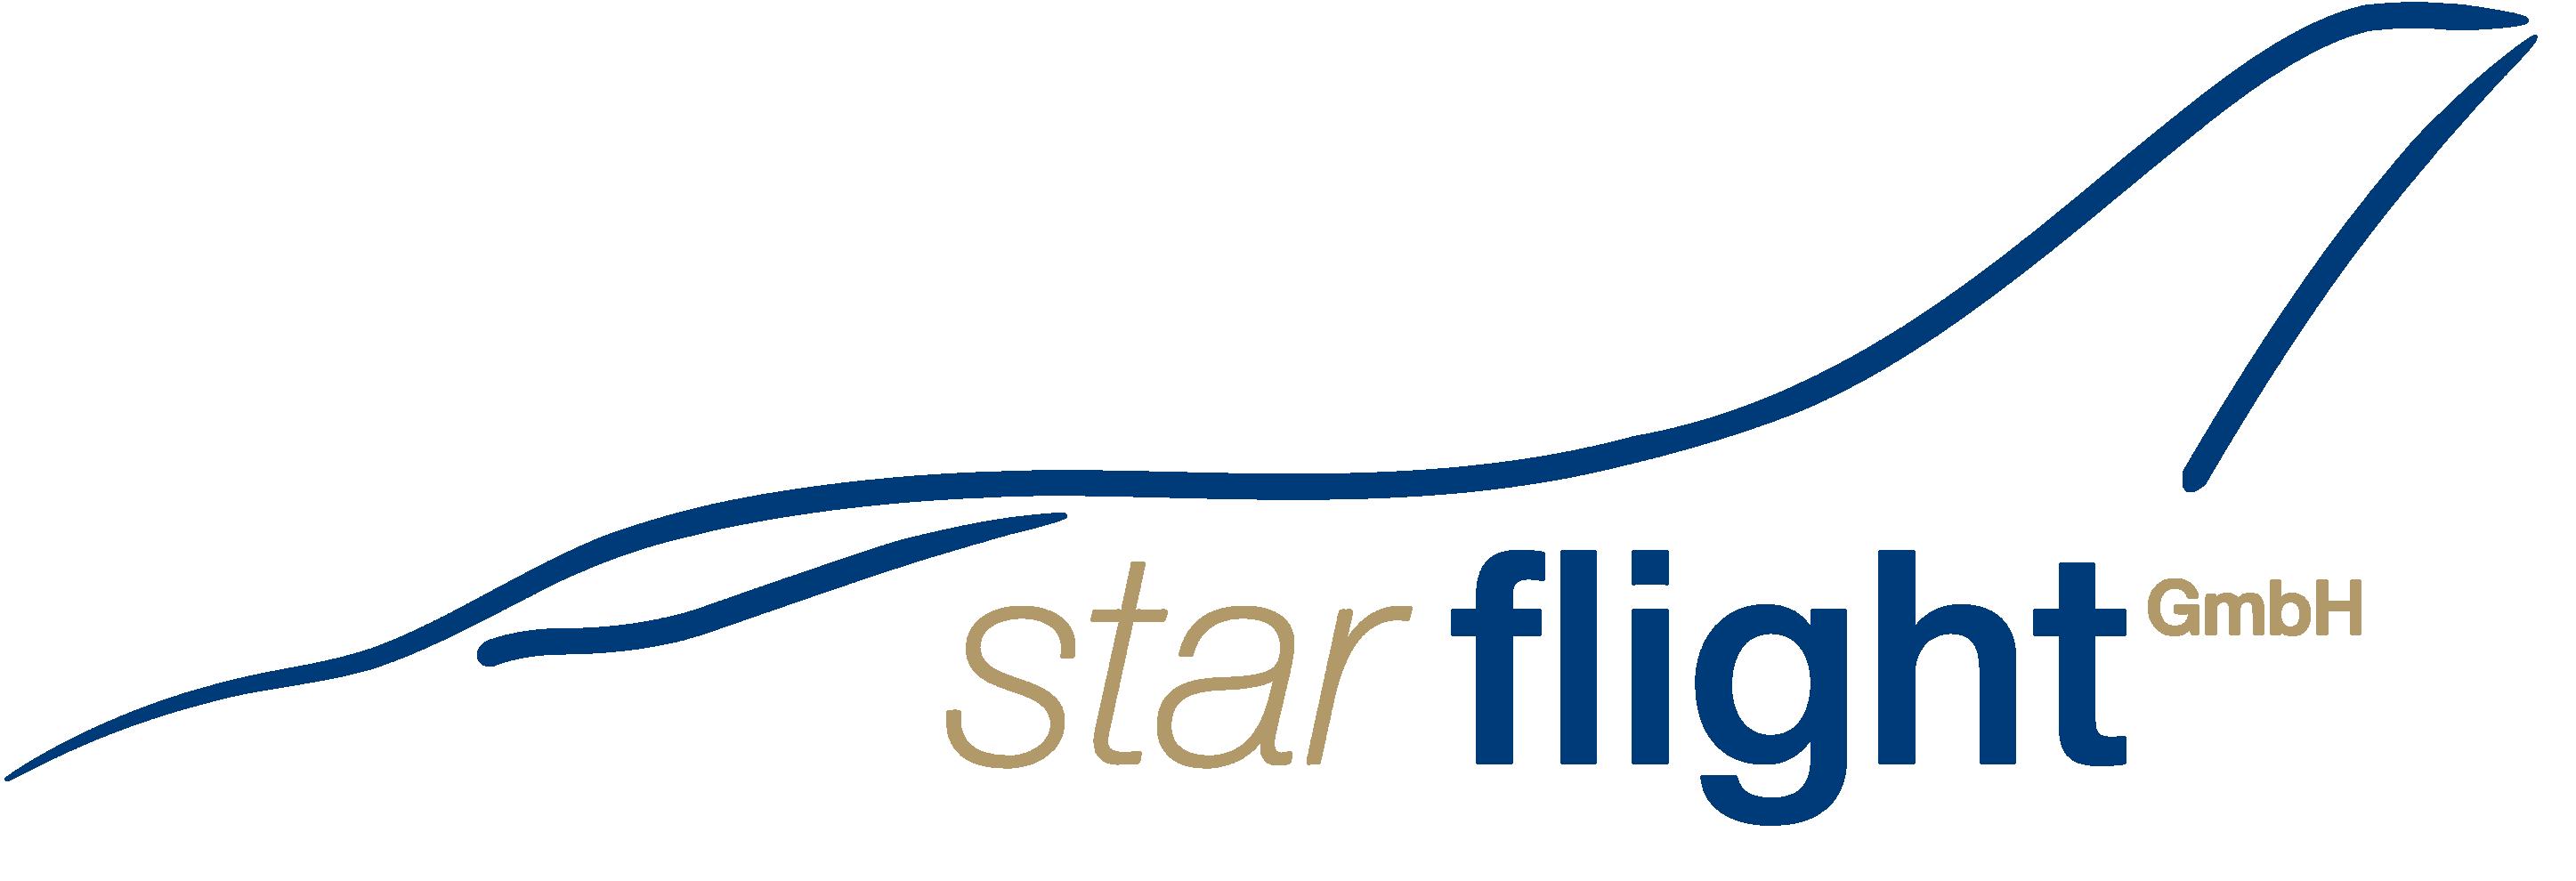 Starflight GmbH. & USFC-Baden